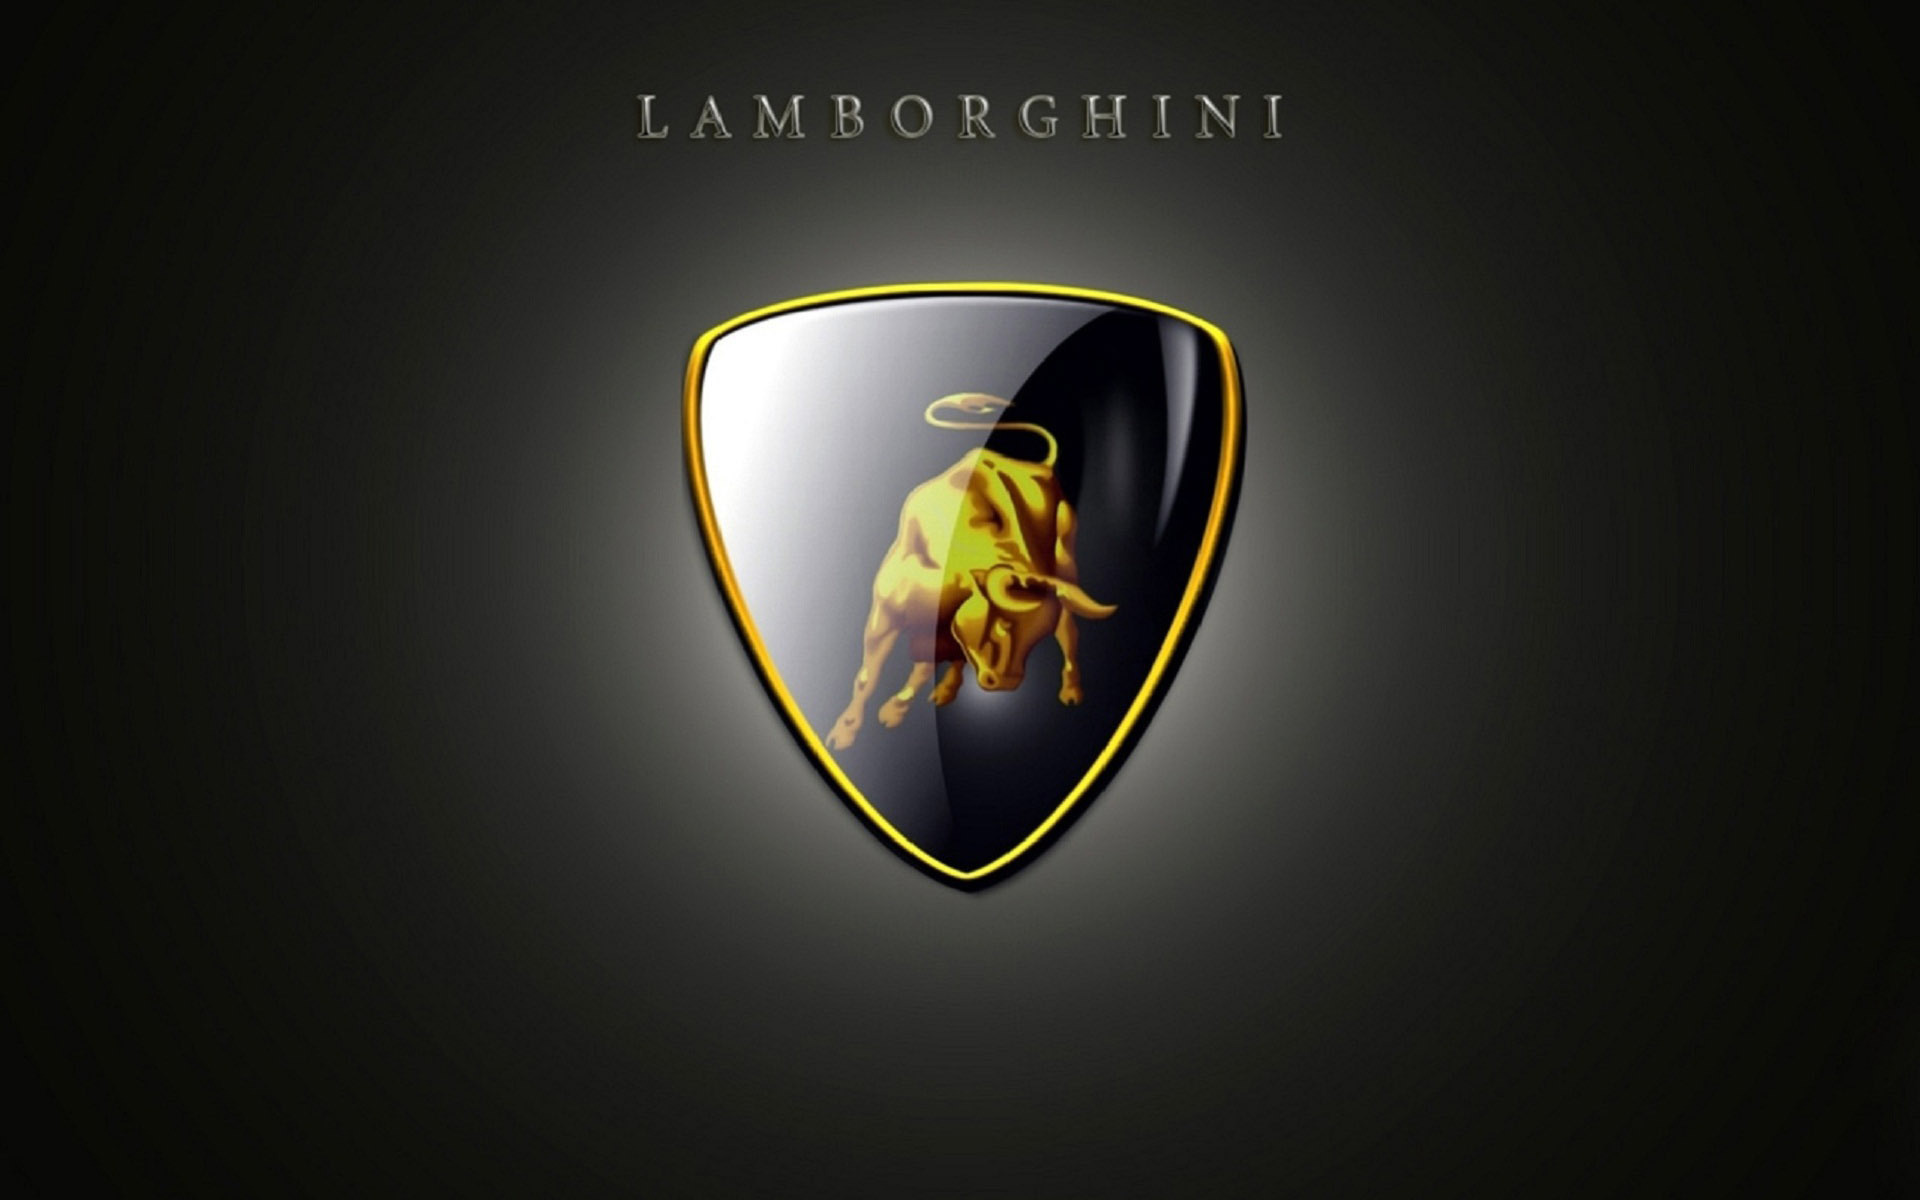 Lamborghini Logo 3 HD Image